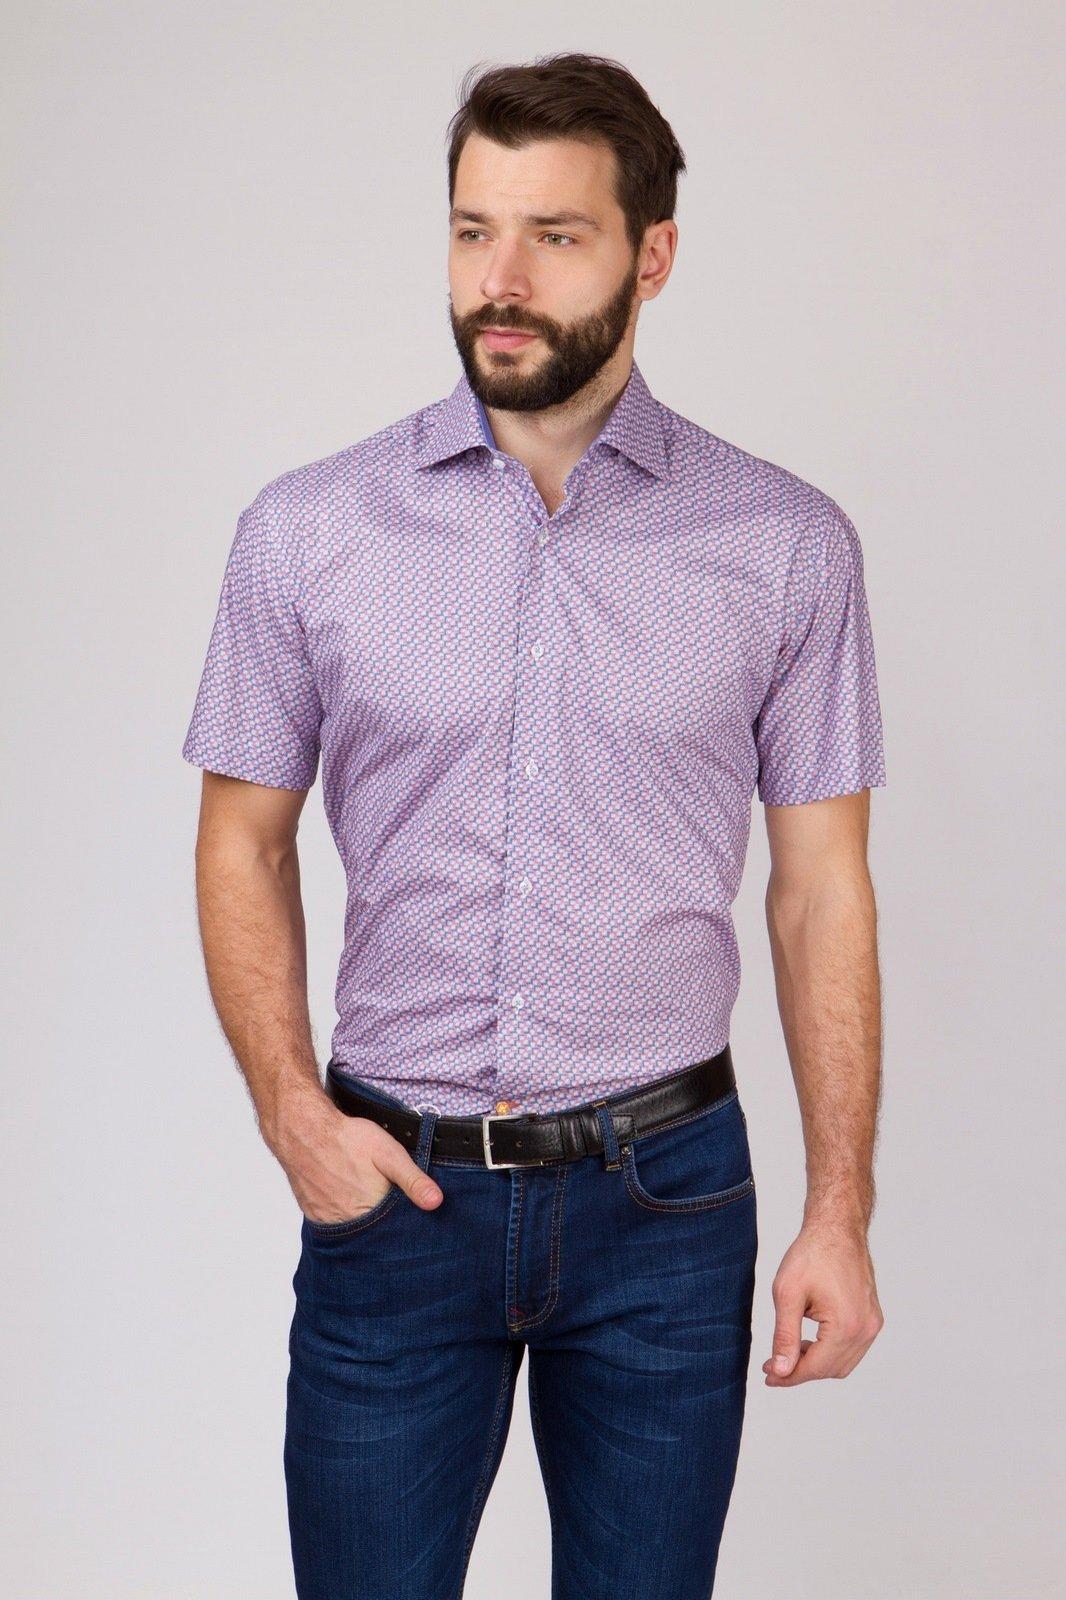 Рубашка приталенная из хлопка с коротким рукавом KANZLER